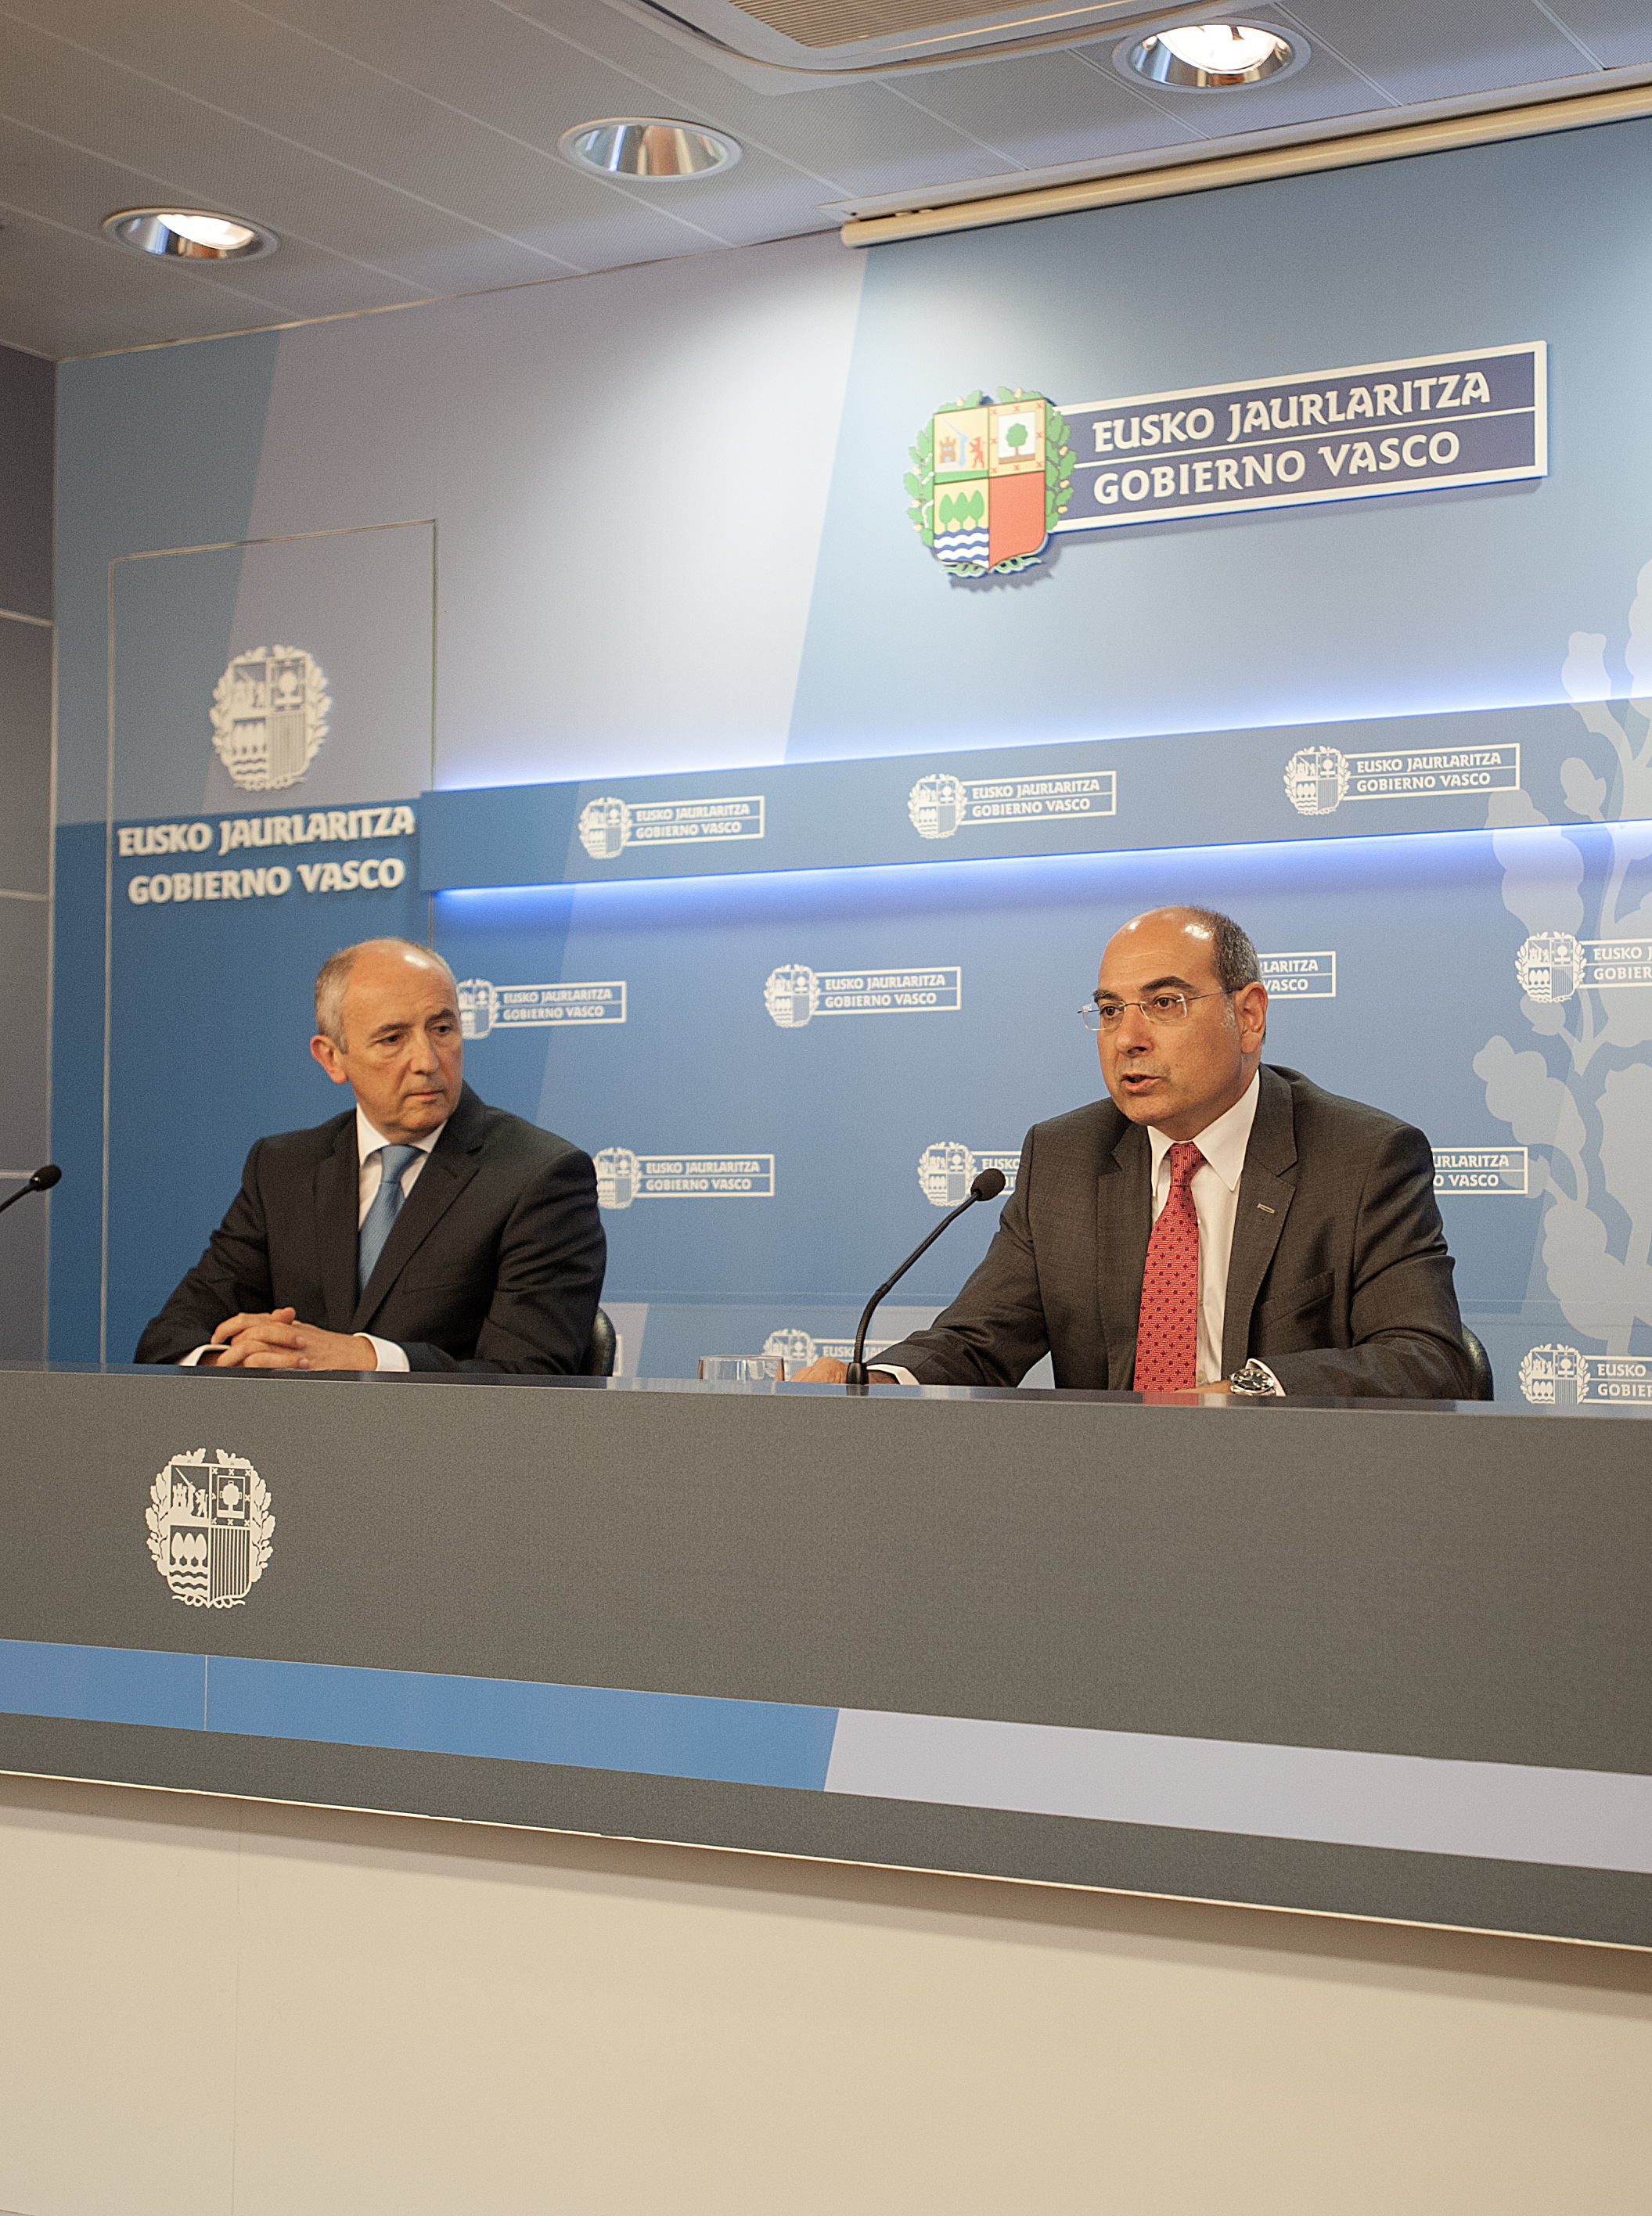 20150707_consejo_gobierno4.jpg